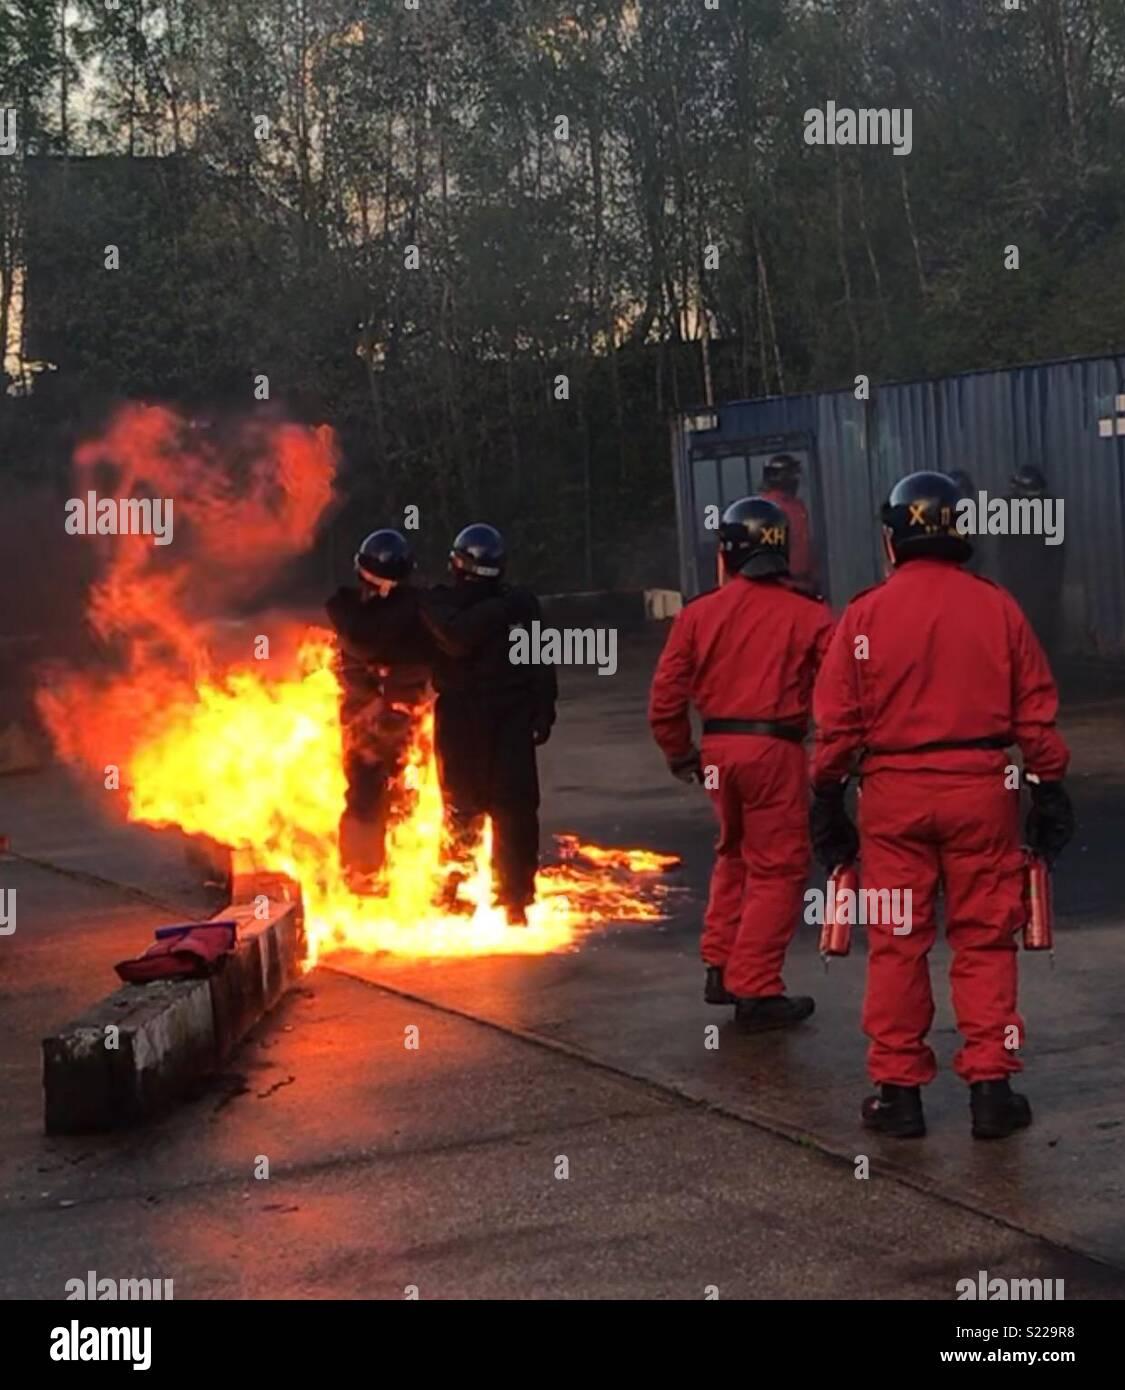 Formation des agents de police cocktail molotov Photo Stock